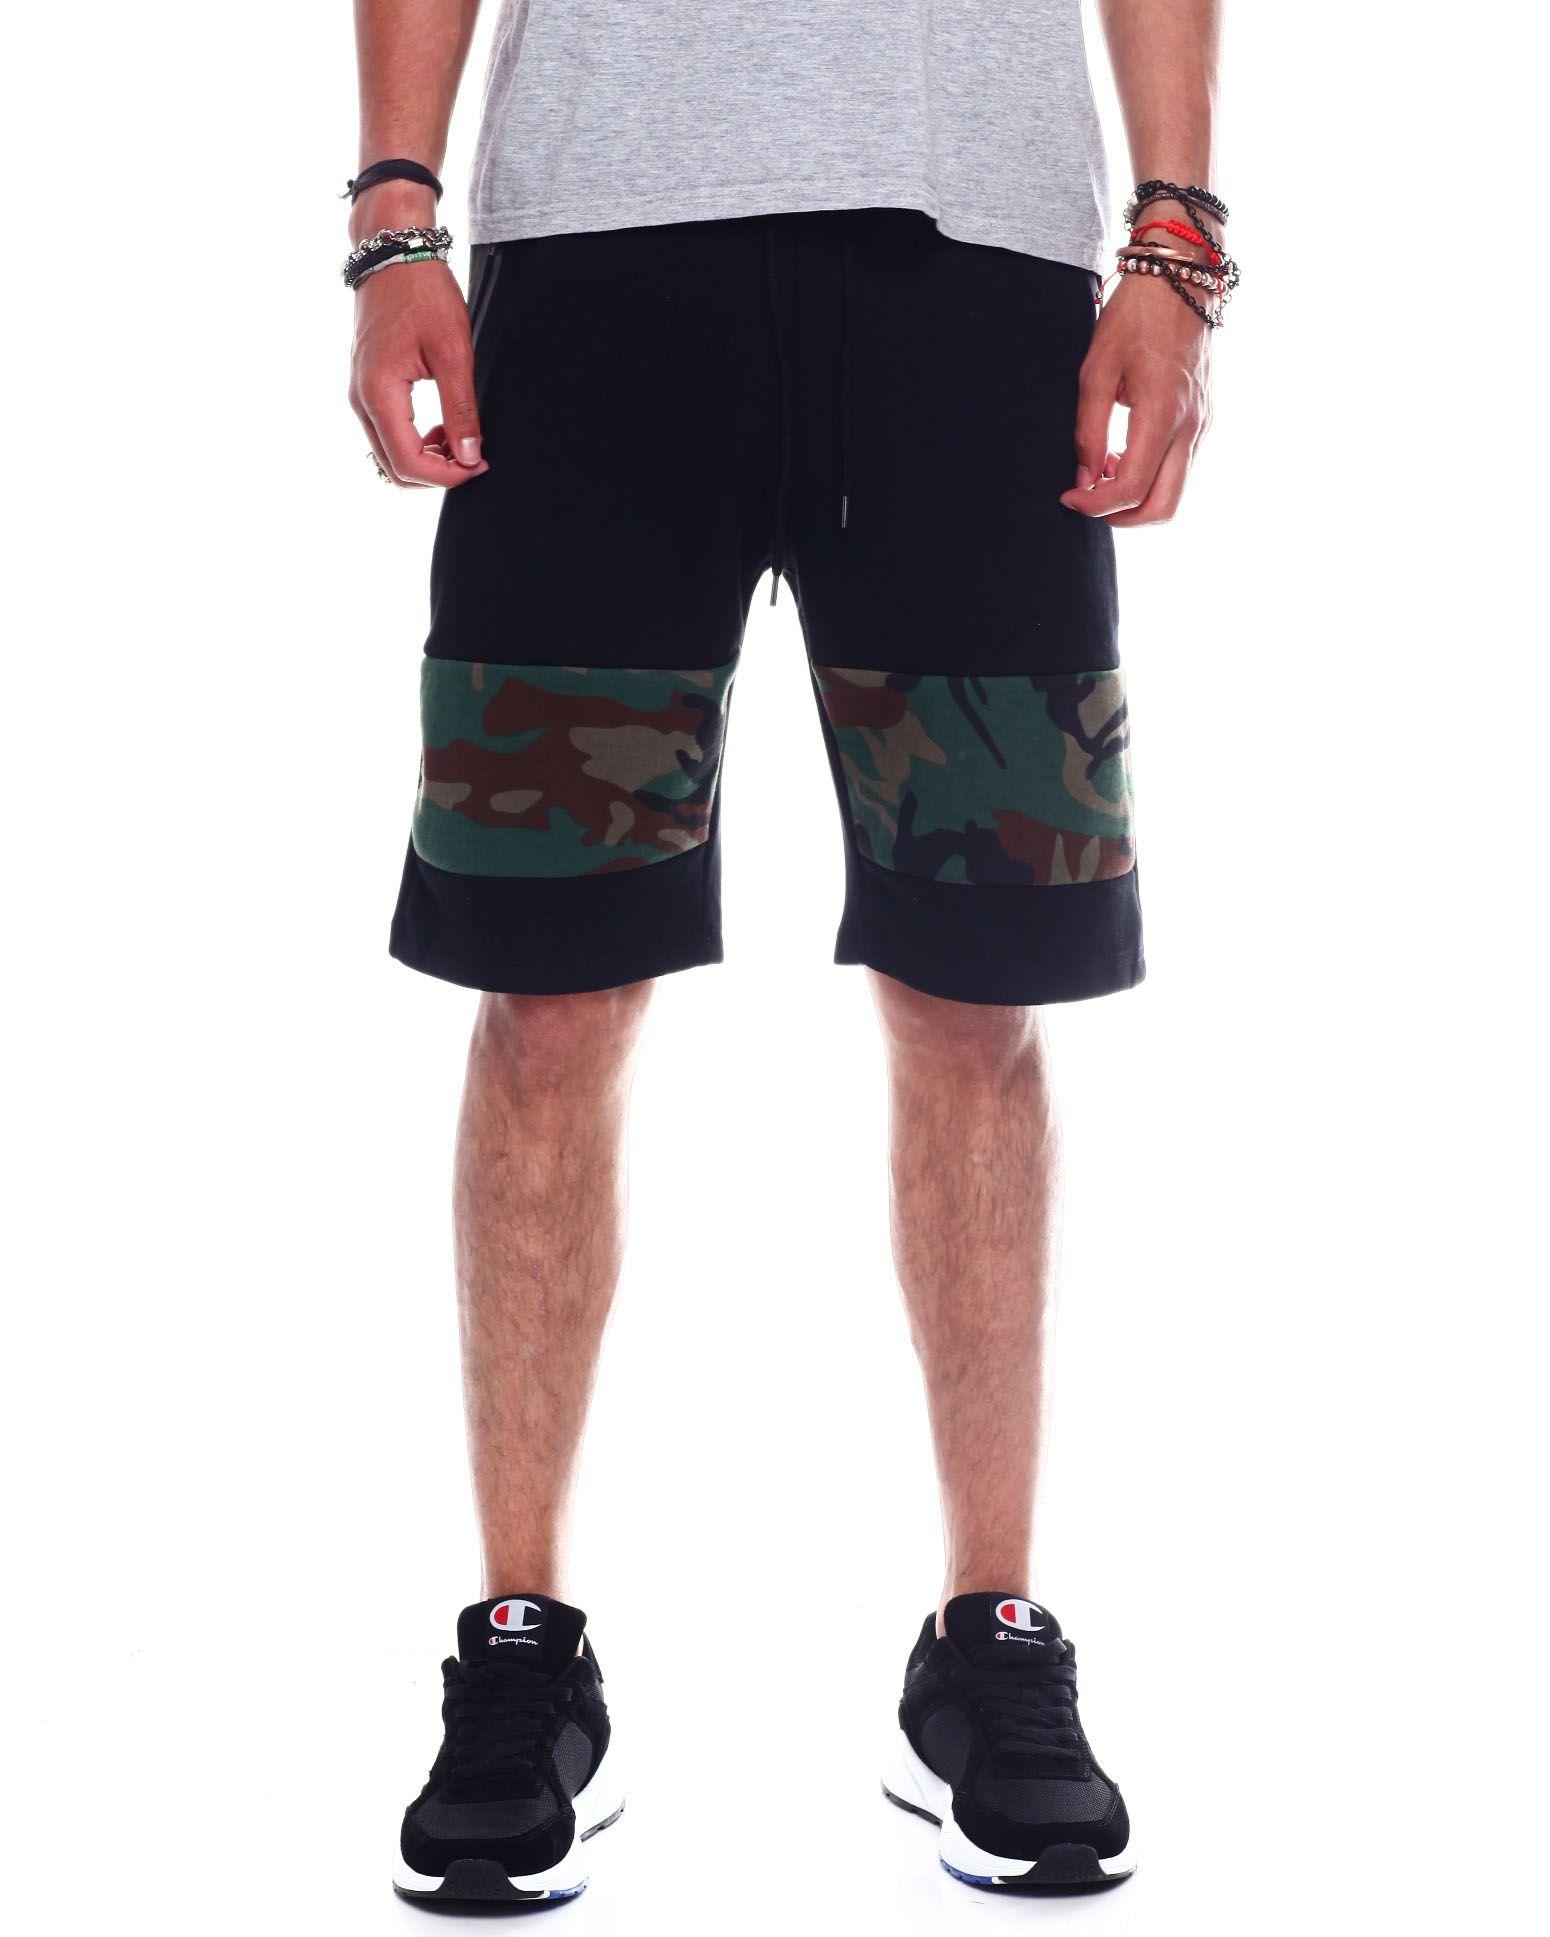 Buy Men's Camo Panel Tech Fleece Short Men's Shorts from